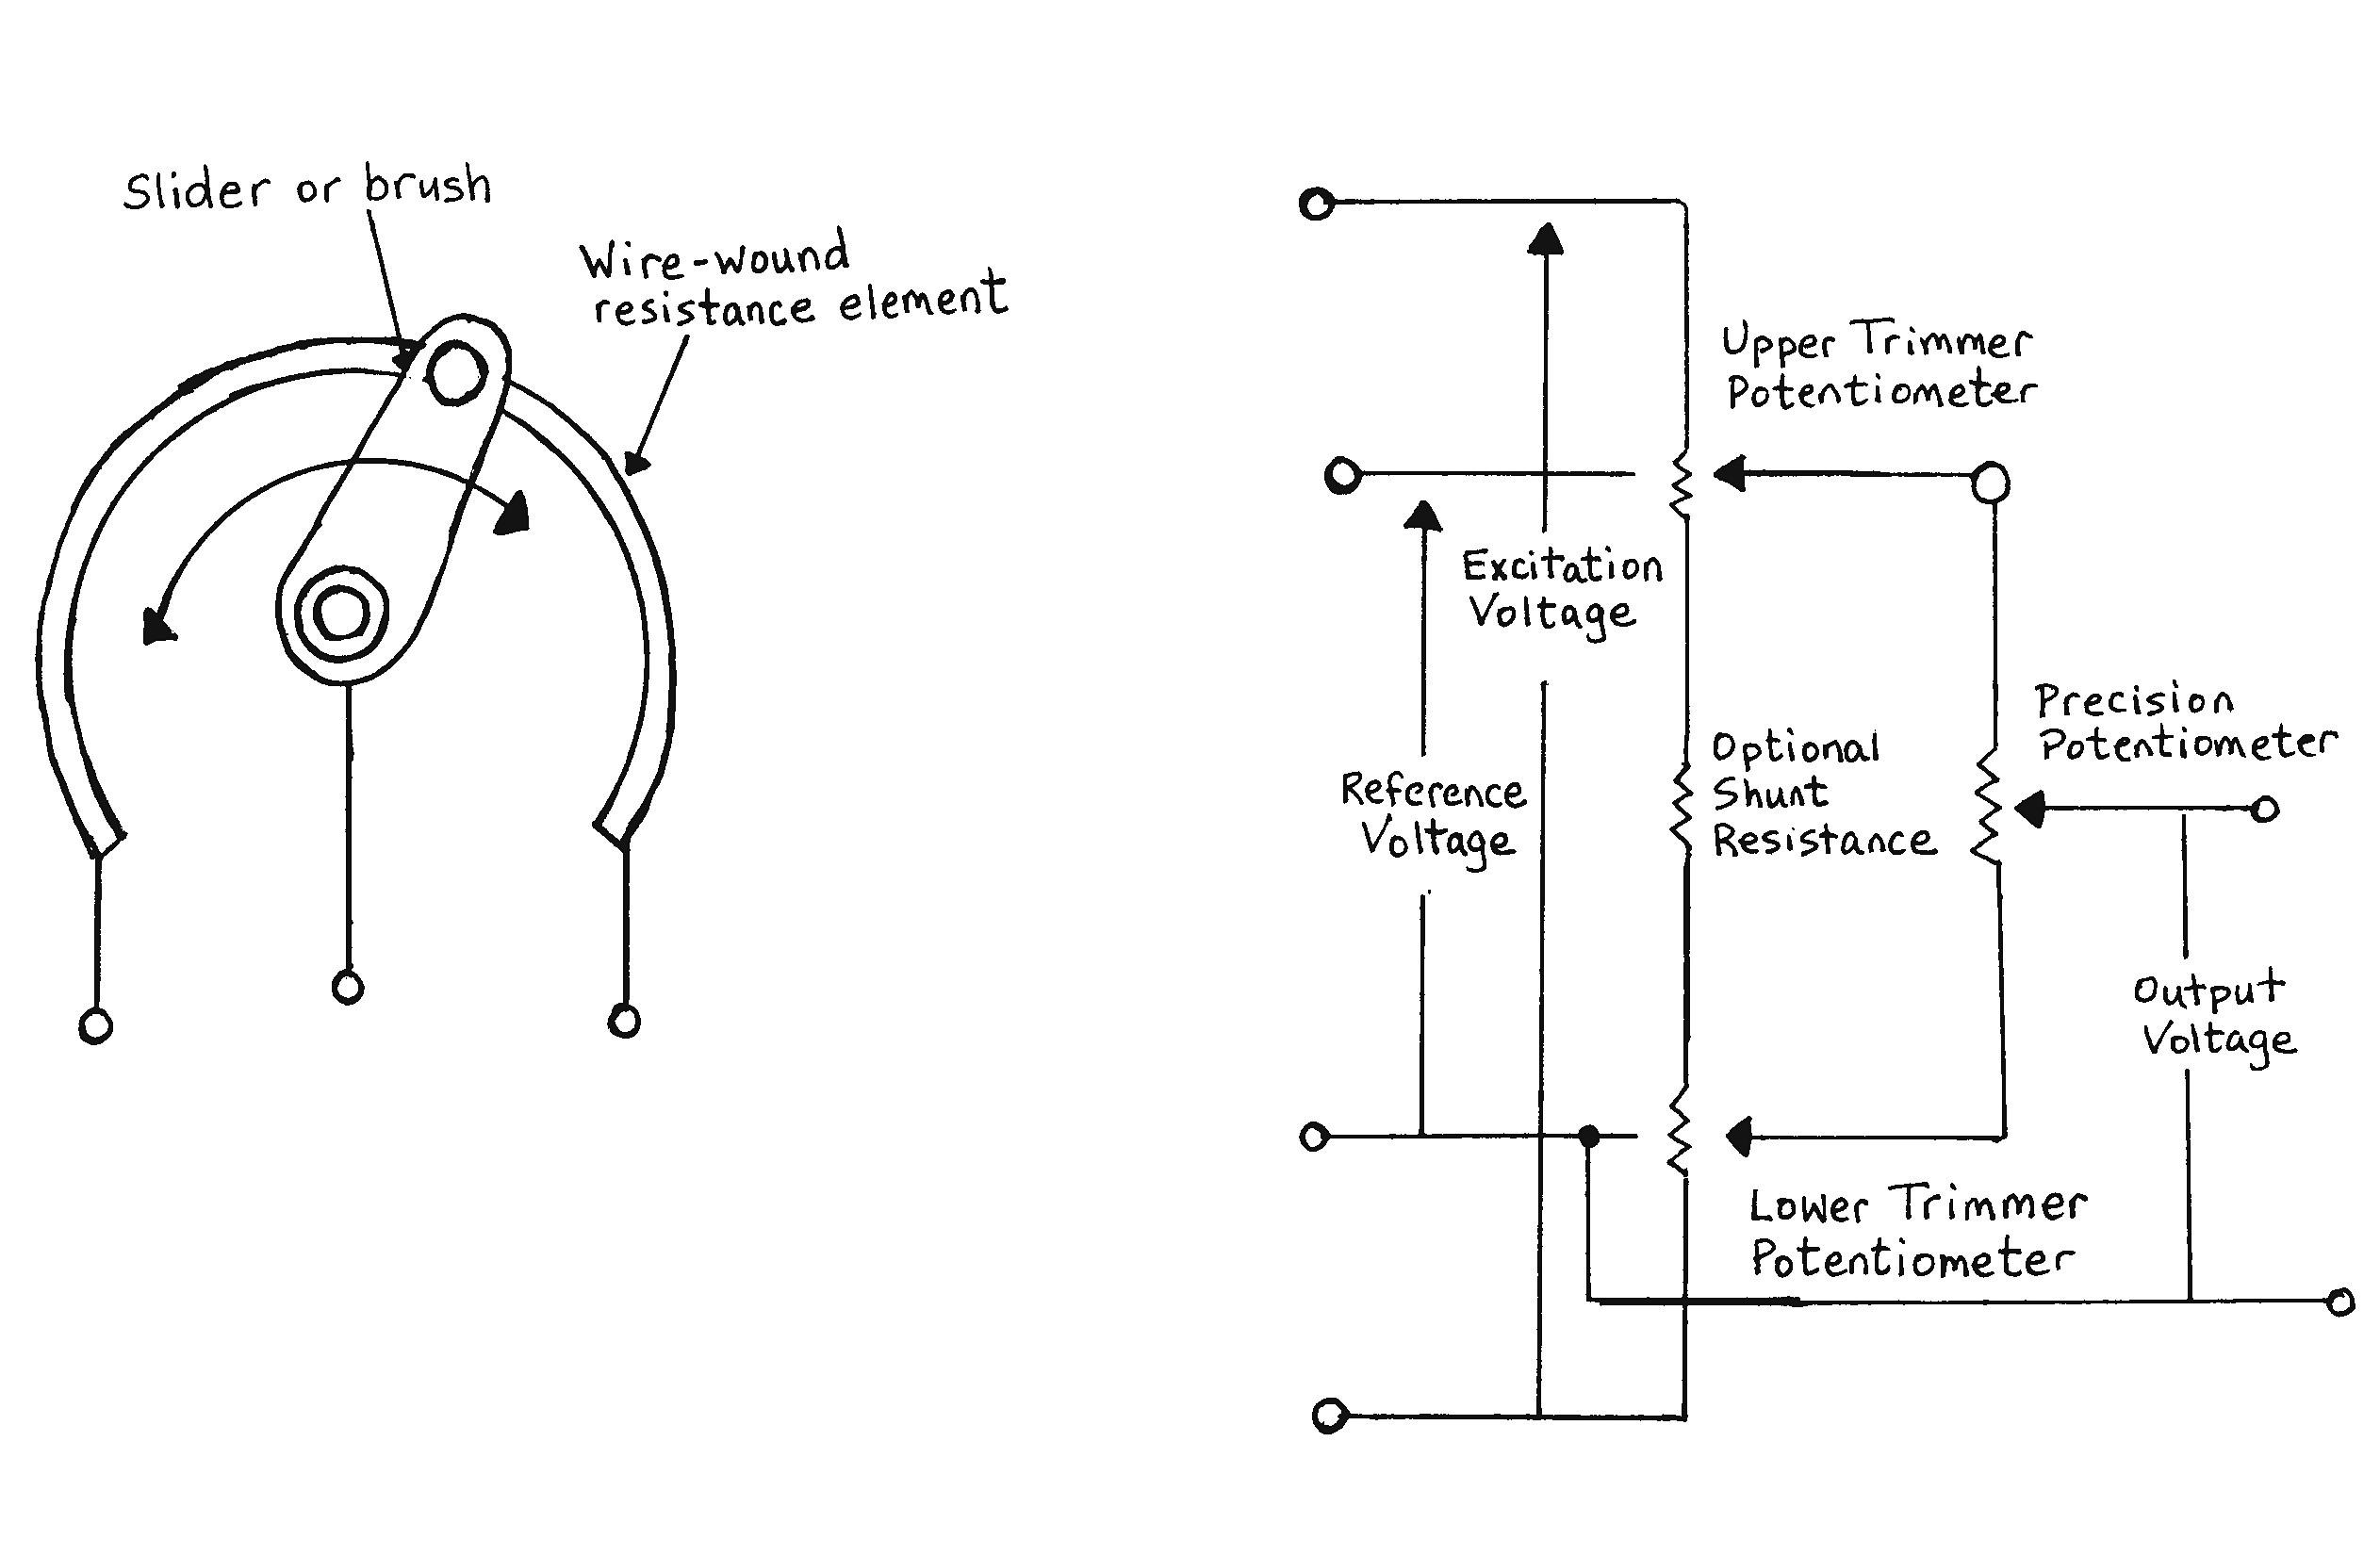 Generous Potentiometer Wiring Diagram Contemporary Electrical